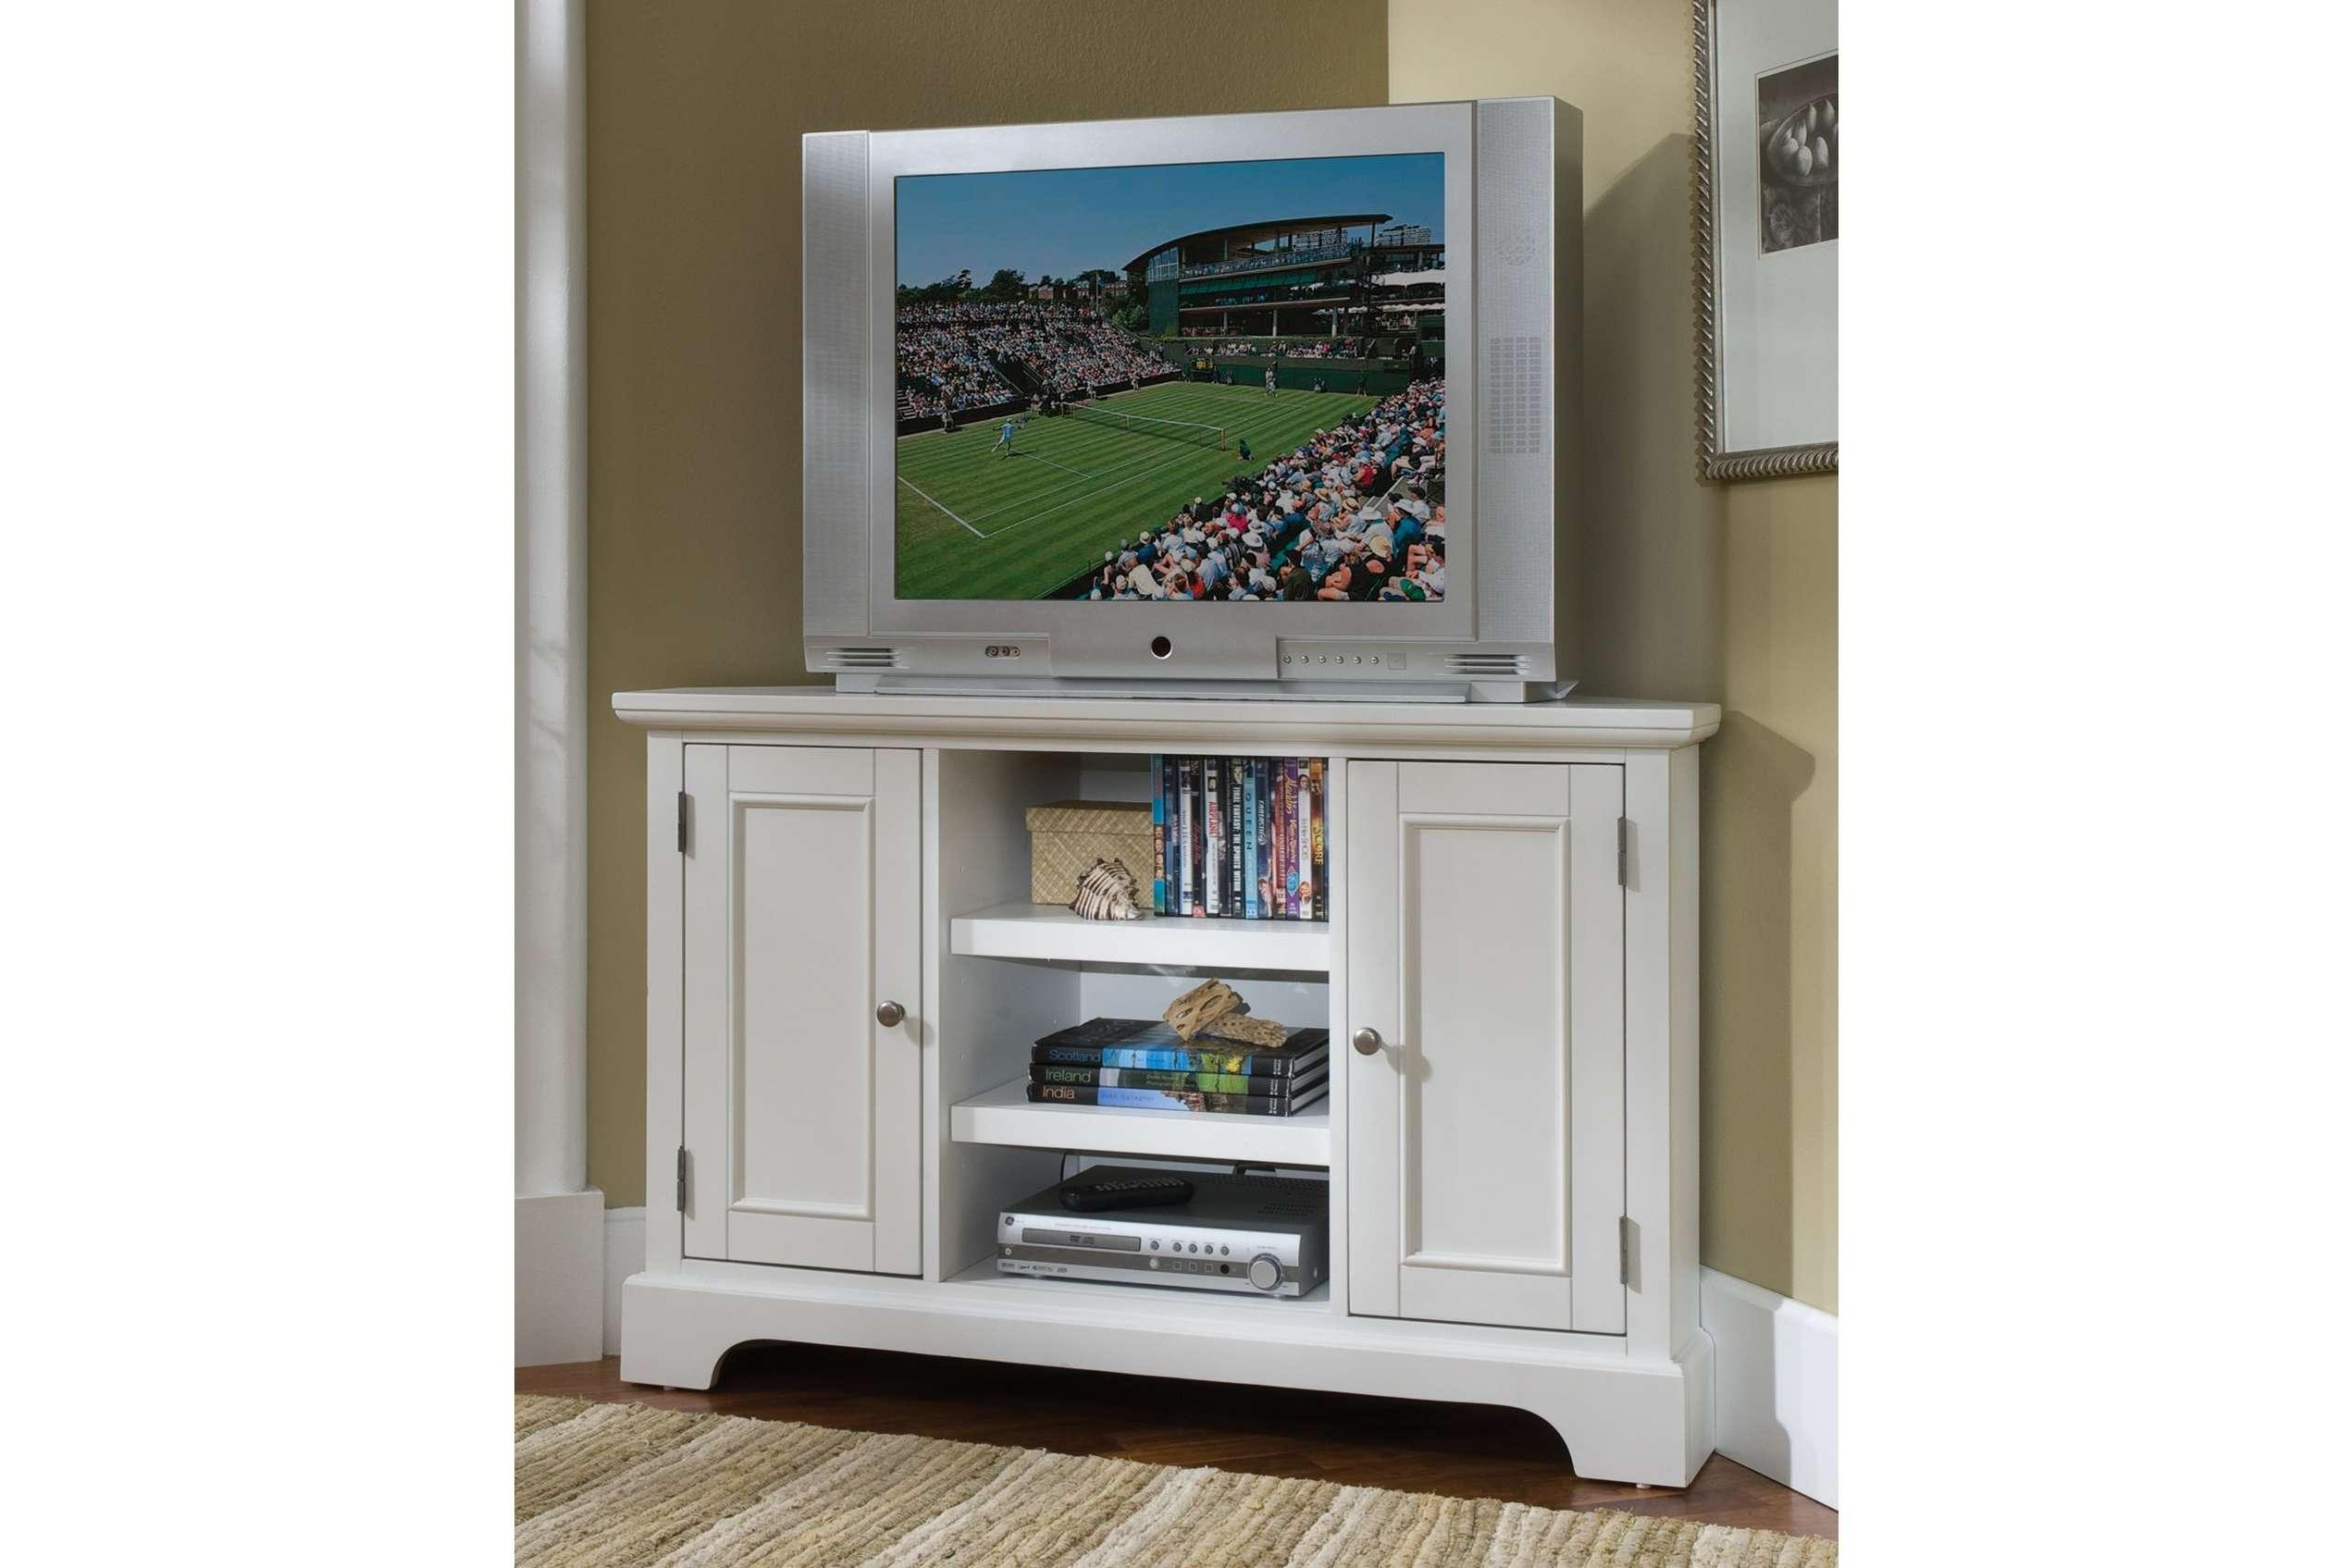 Built In Corner Tv Cabinet Counter Refinished Custom Singular Unit Regarding Corner Tv Cabinets (View 19 of 20)